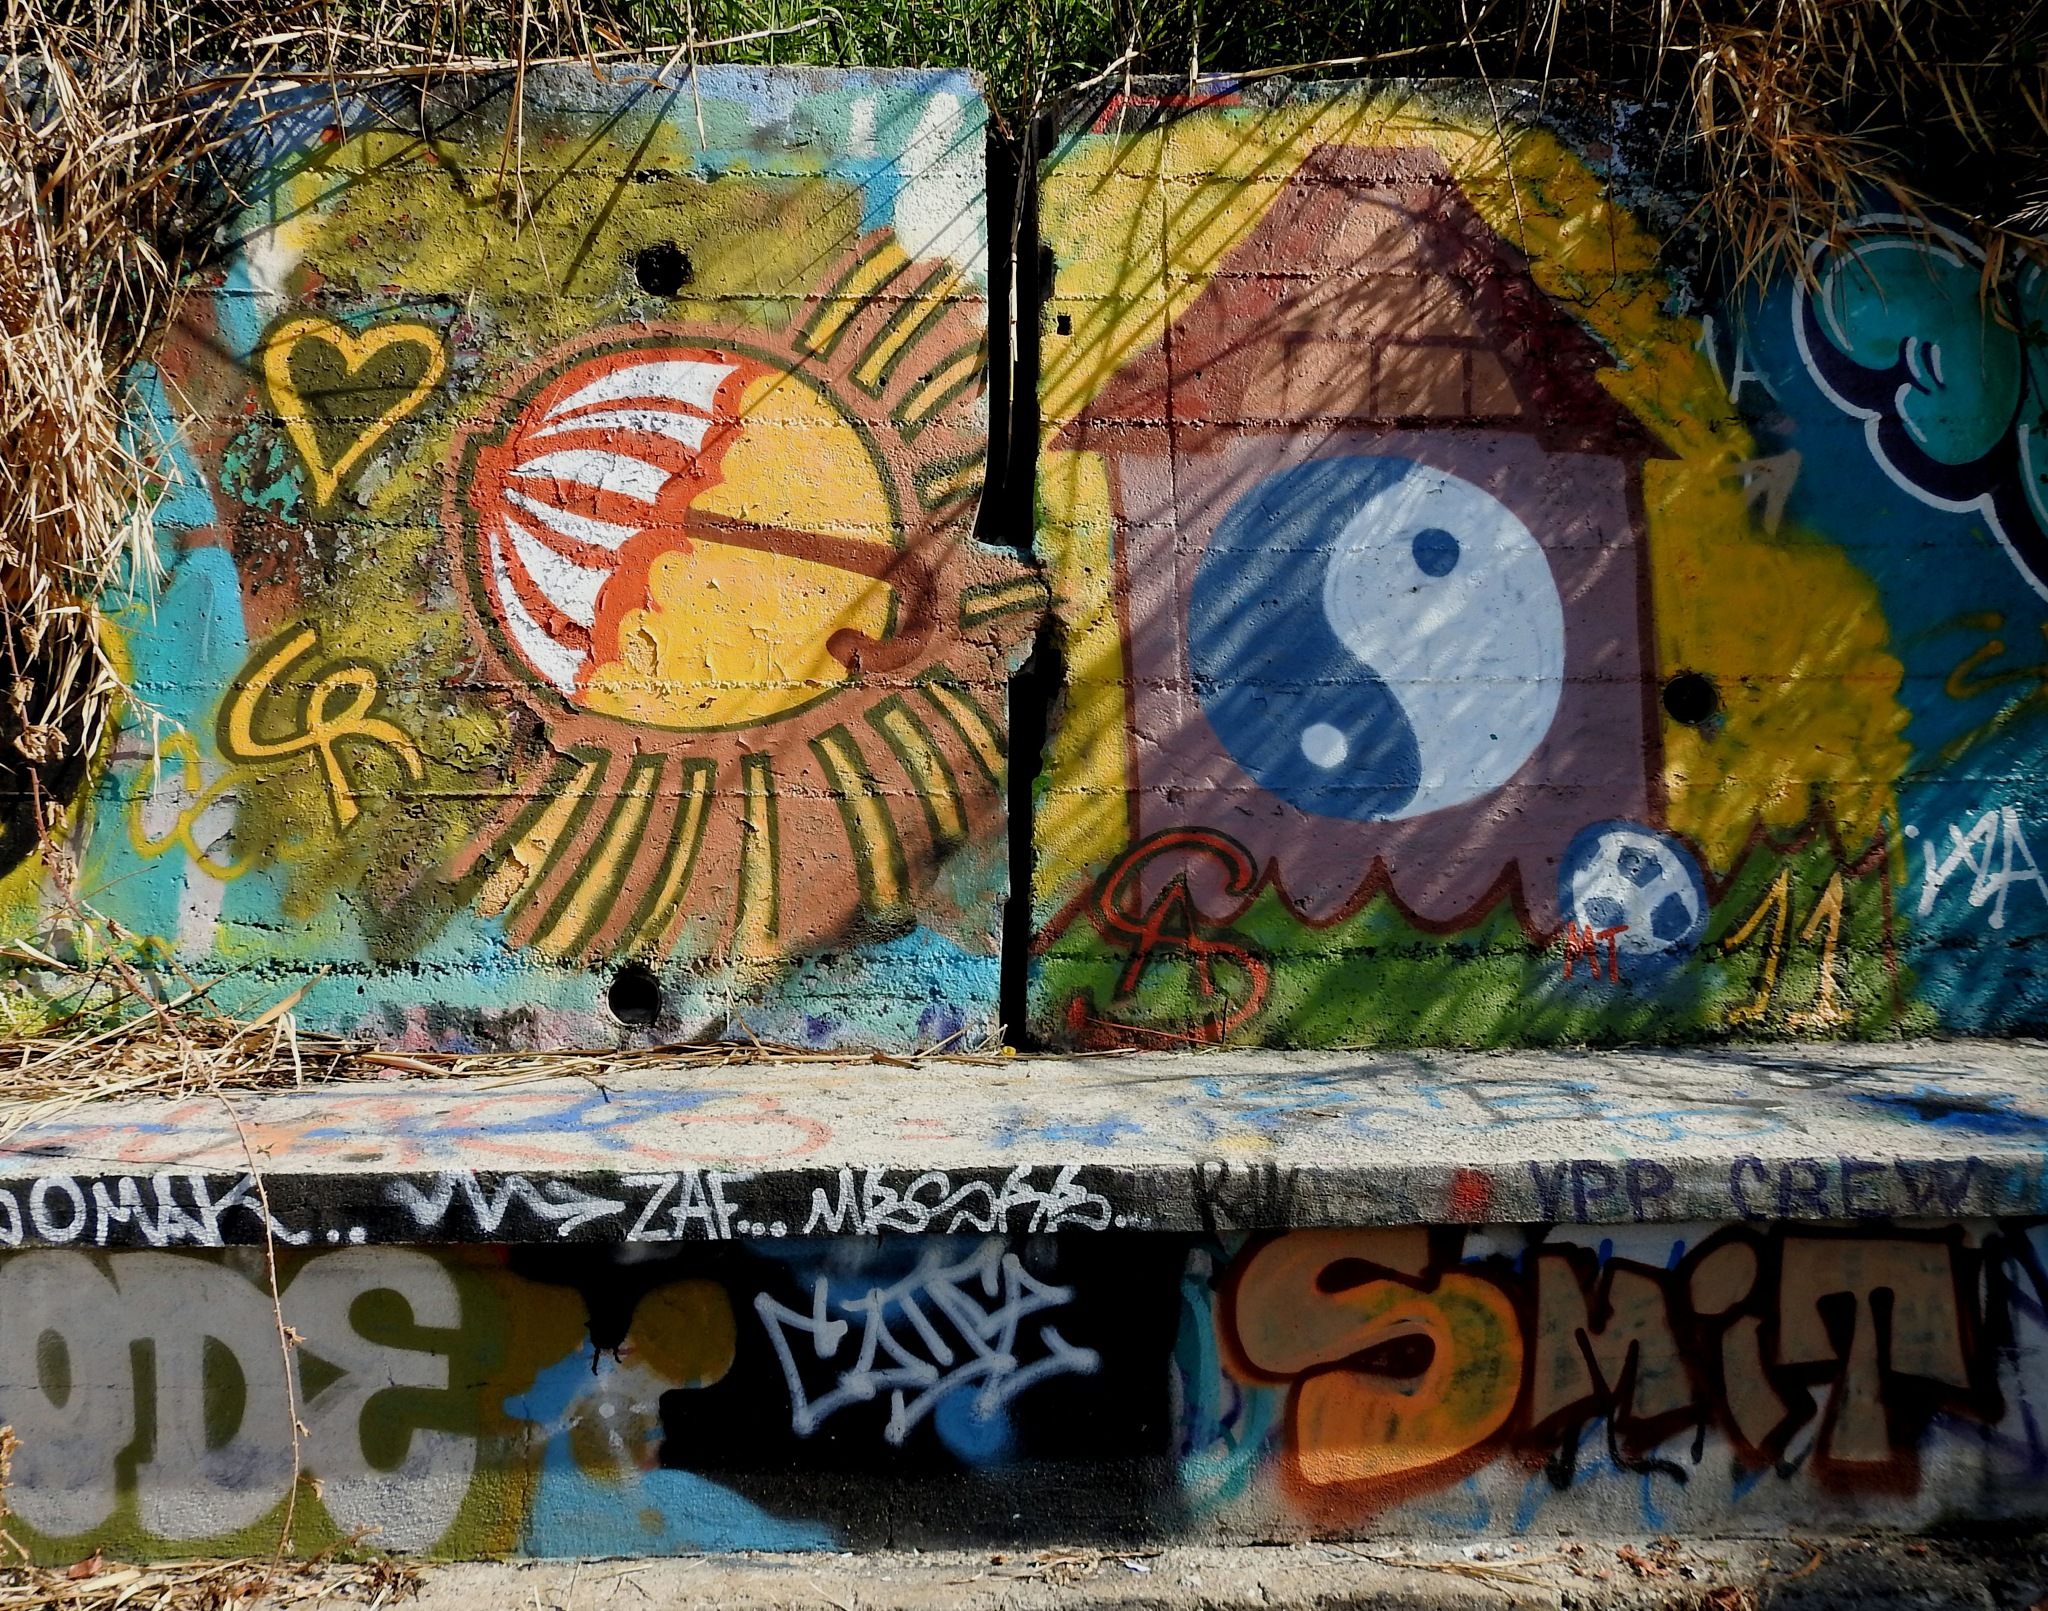 Naples Bagnoli - Street Art - Yin And Yang! by Delirium Tremends 62